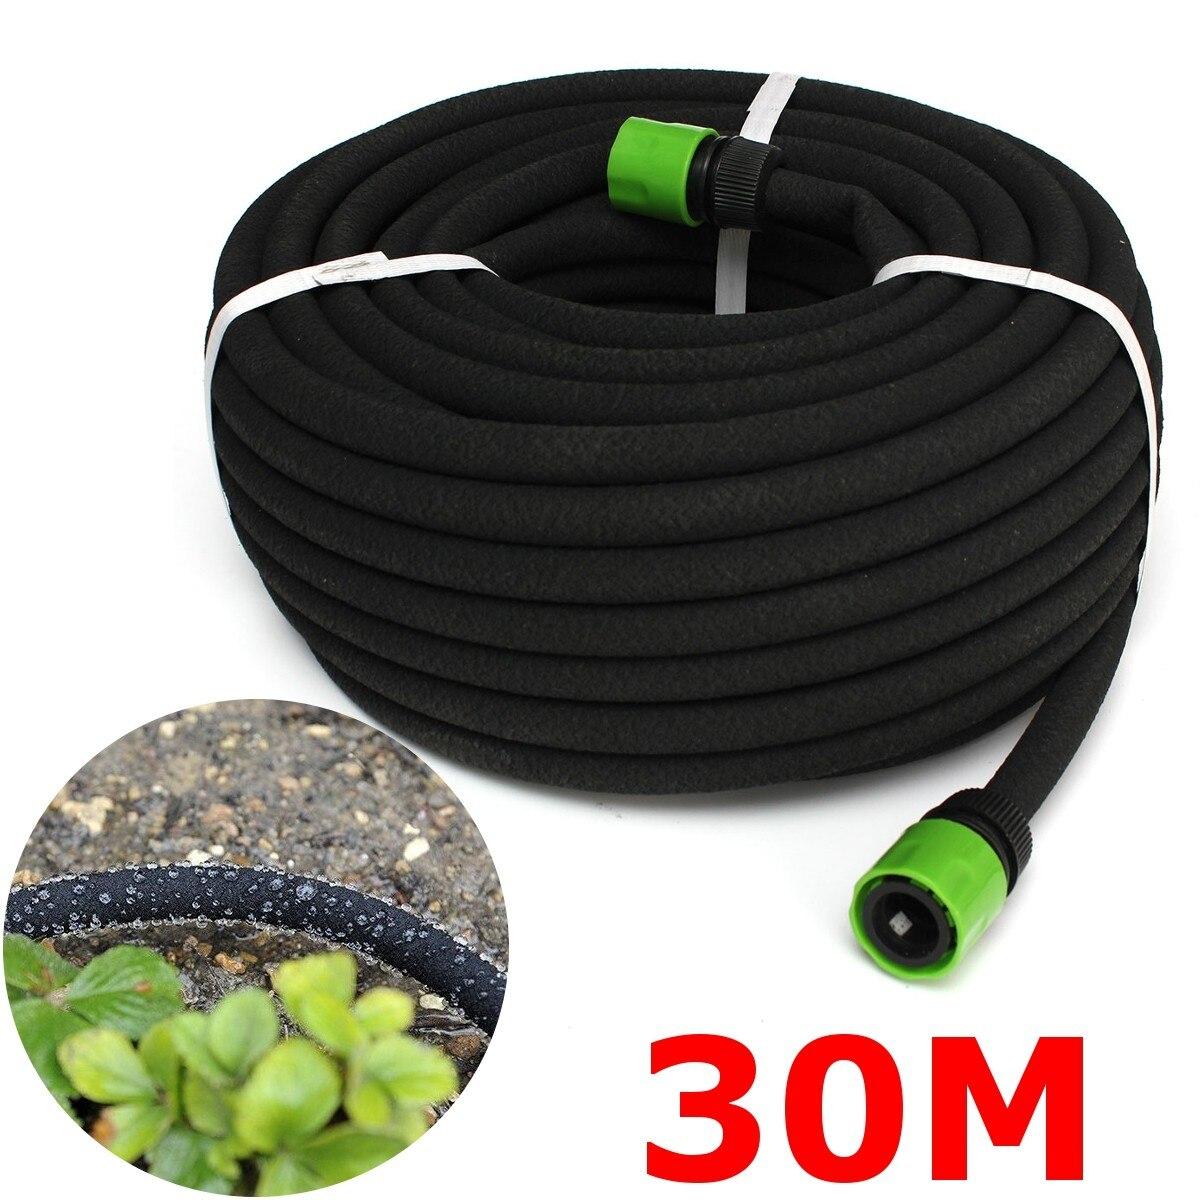 30M Black Porous Irrigation Soaker Hose Watering Dripper Pipe Lawn Garden Tool Equipment